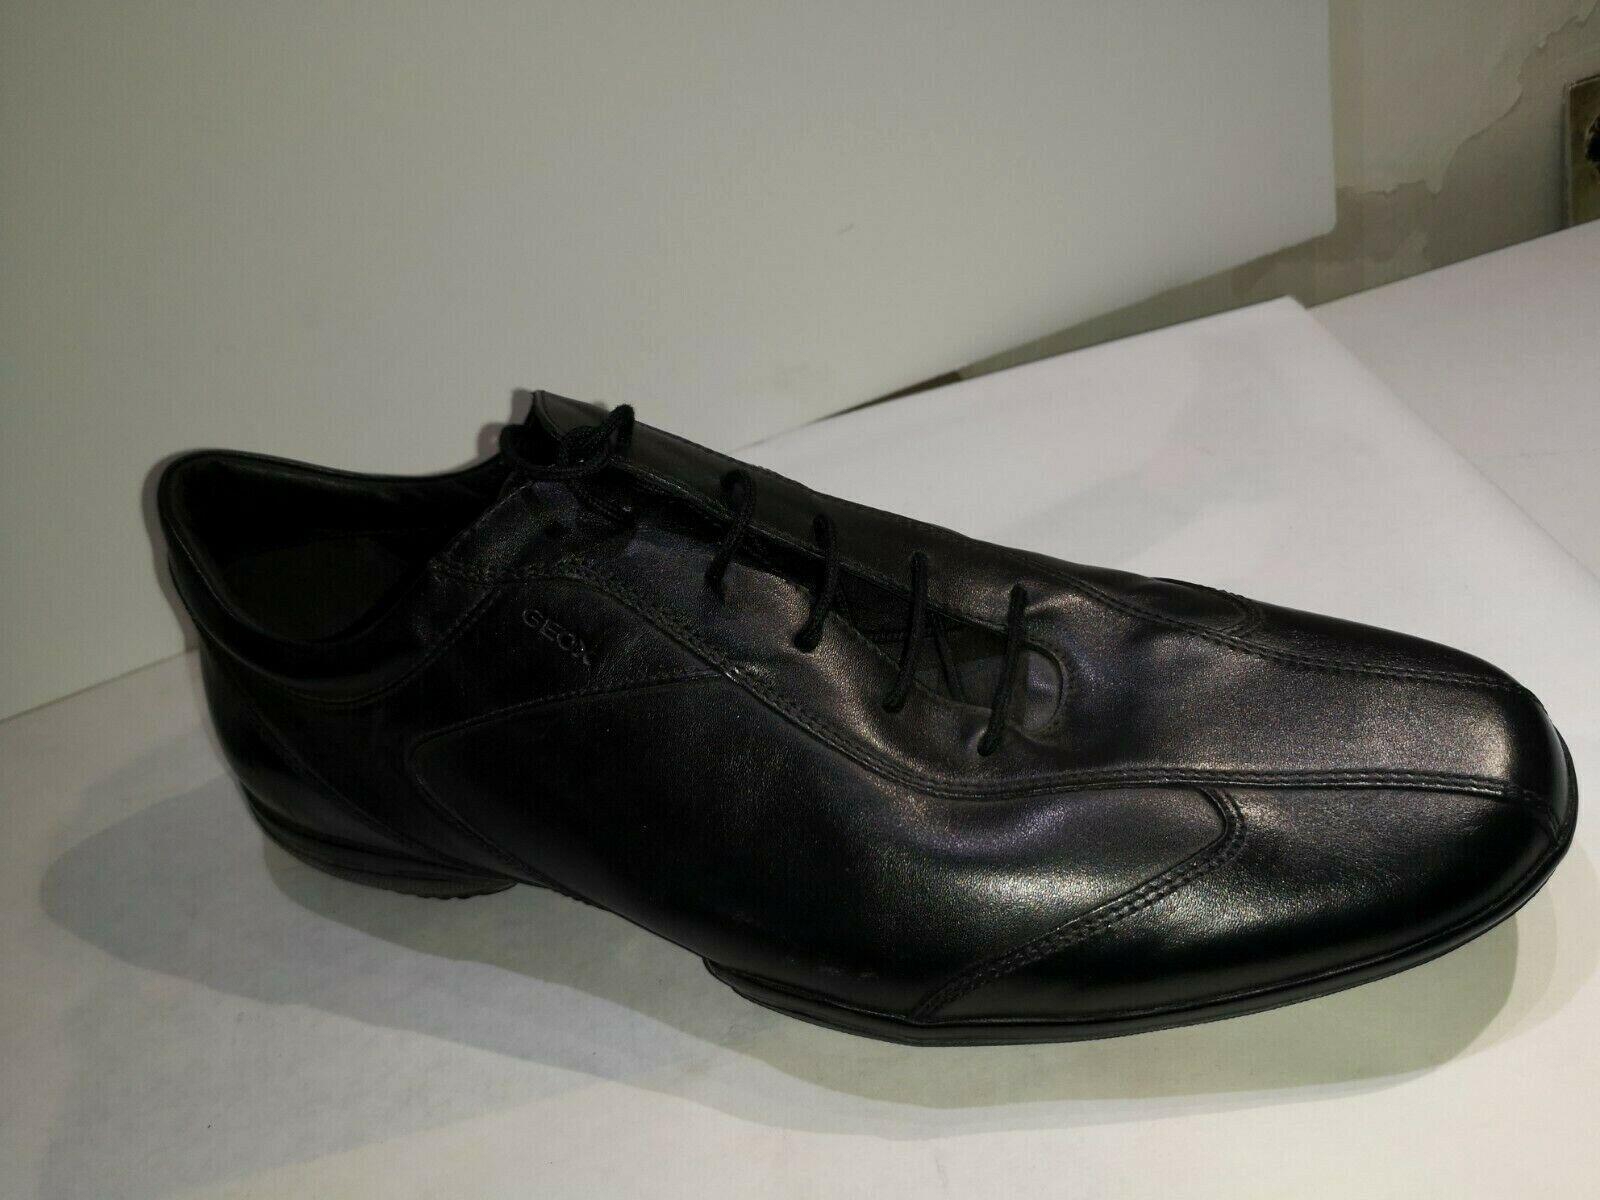 BRUGLIA Loafer Pumps 6170 Silber Metallic Leder Damen Schuhe Gr 37 NP 235 Neu